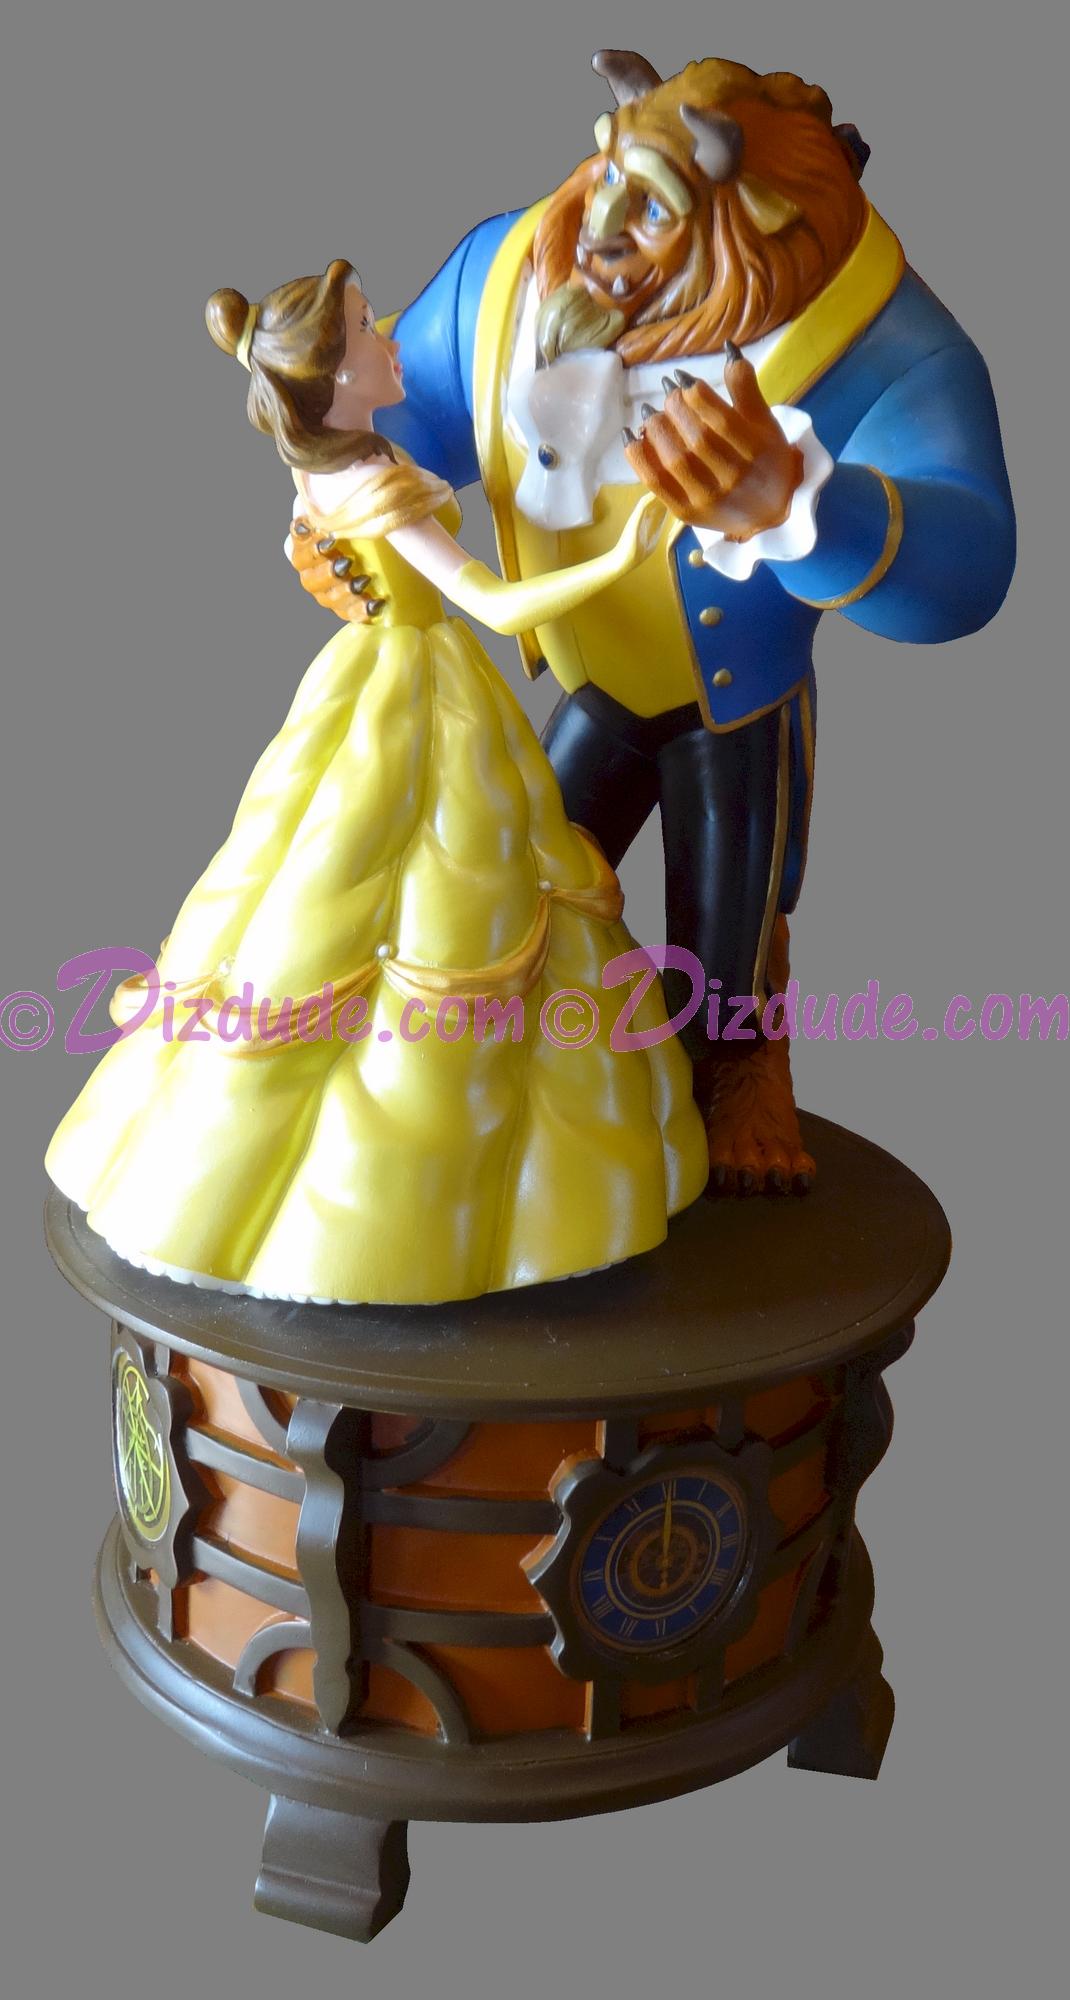 Beauty and the Beast Music Box ~ Disney Fantasyland Magic Kingdom